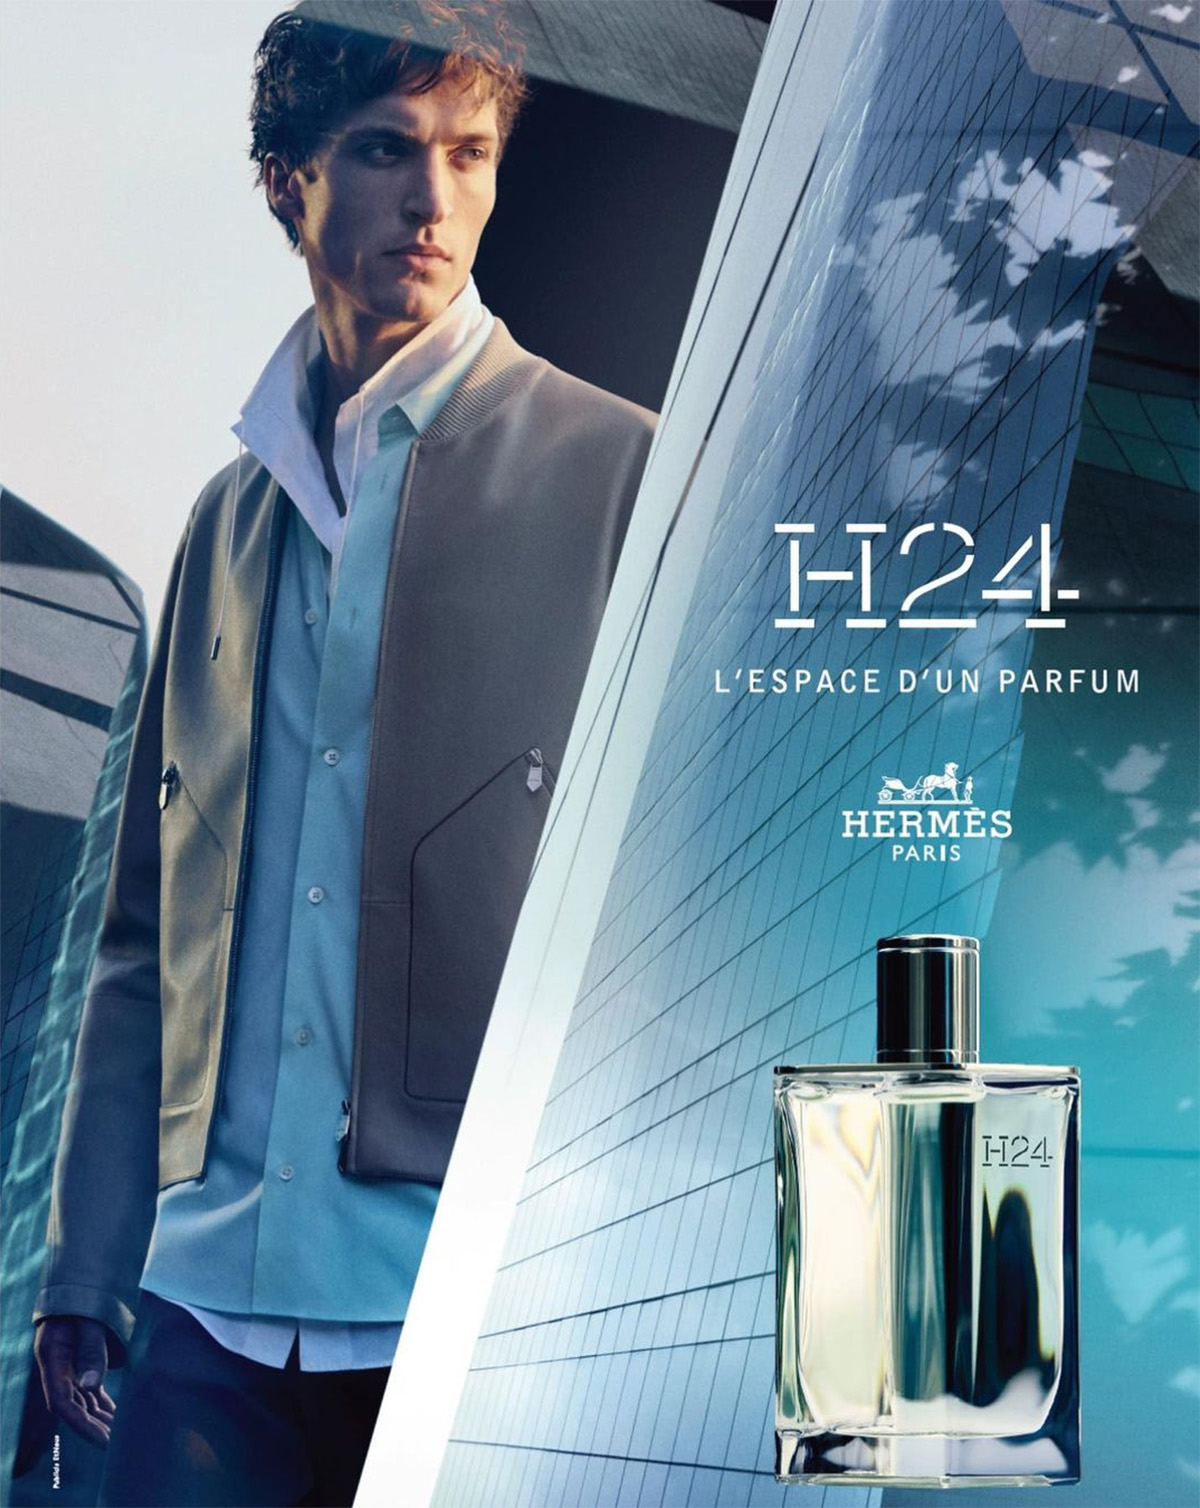 Hermès H24 - Tim Dibble